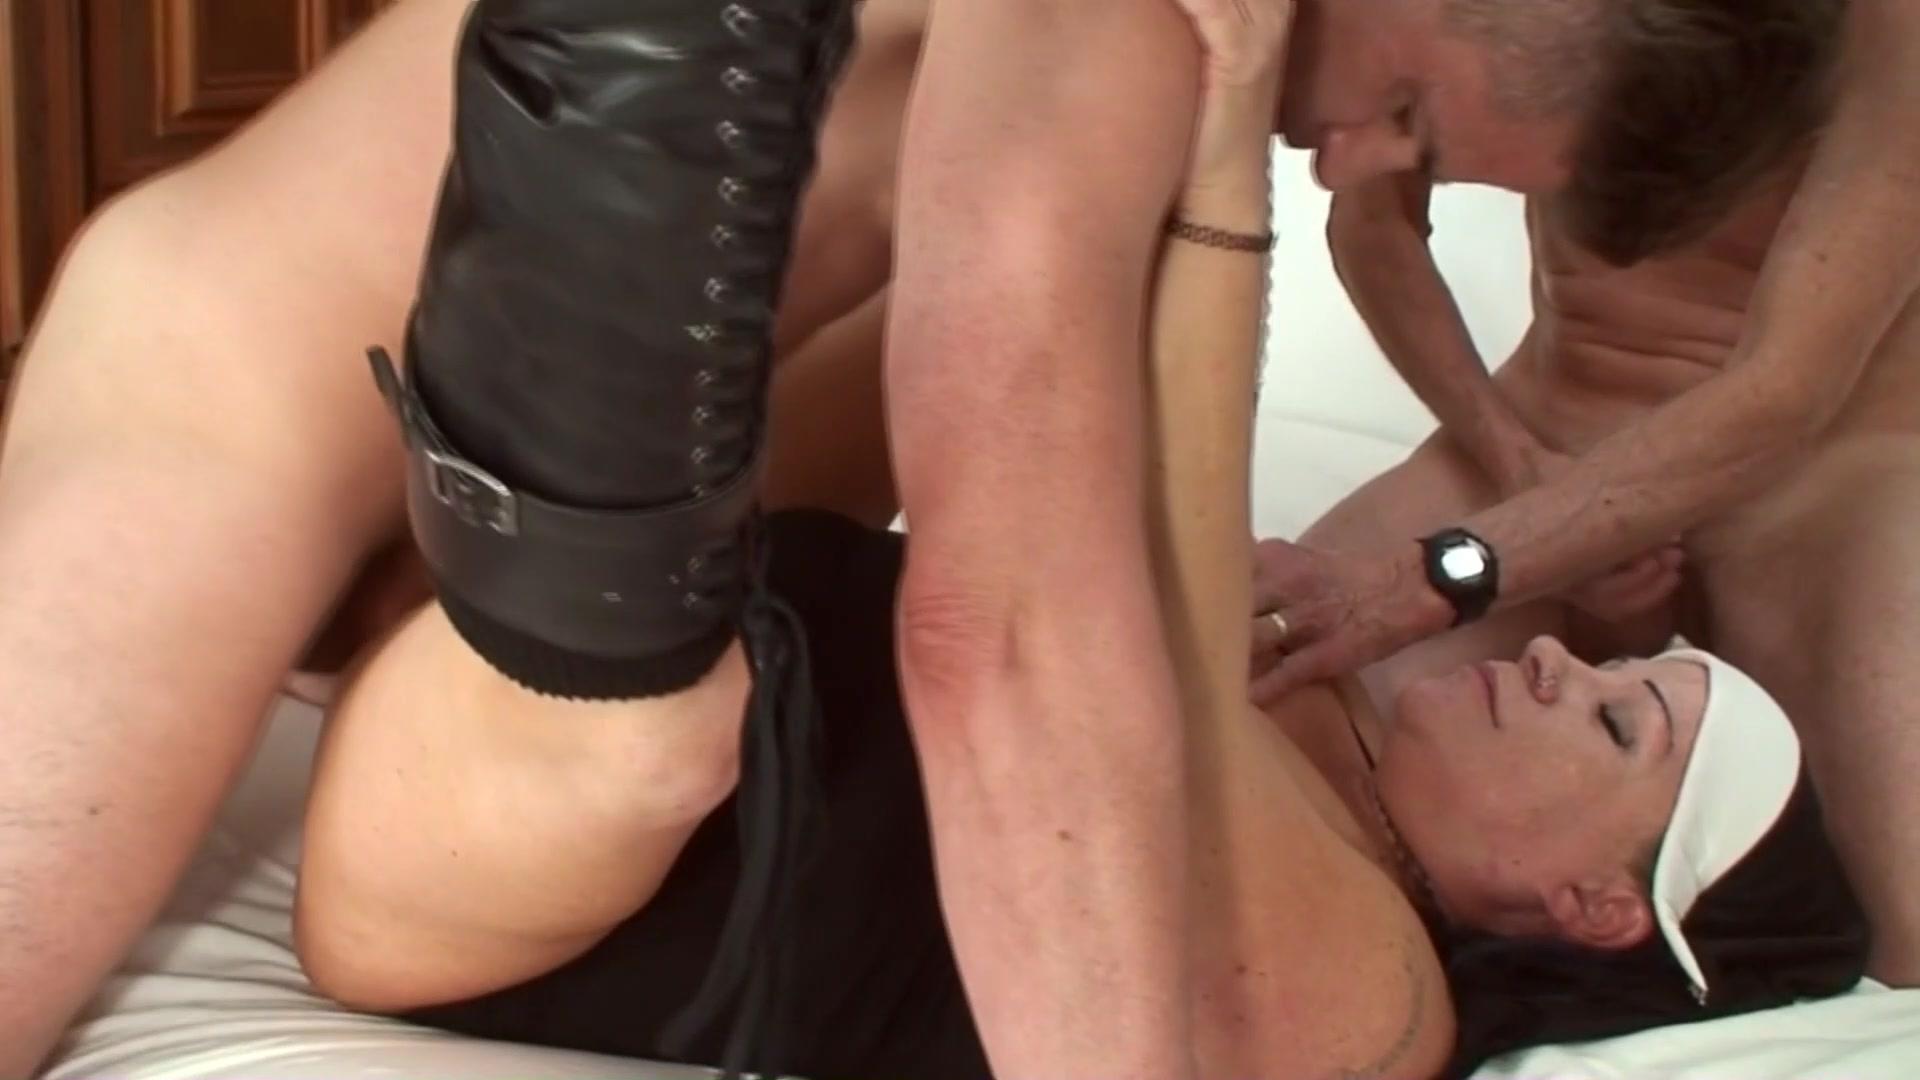 Hanner montaner getting her tits showen